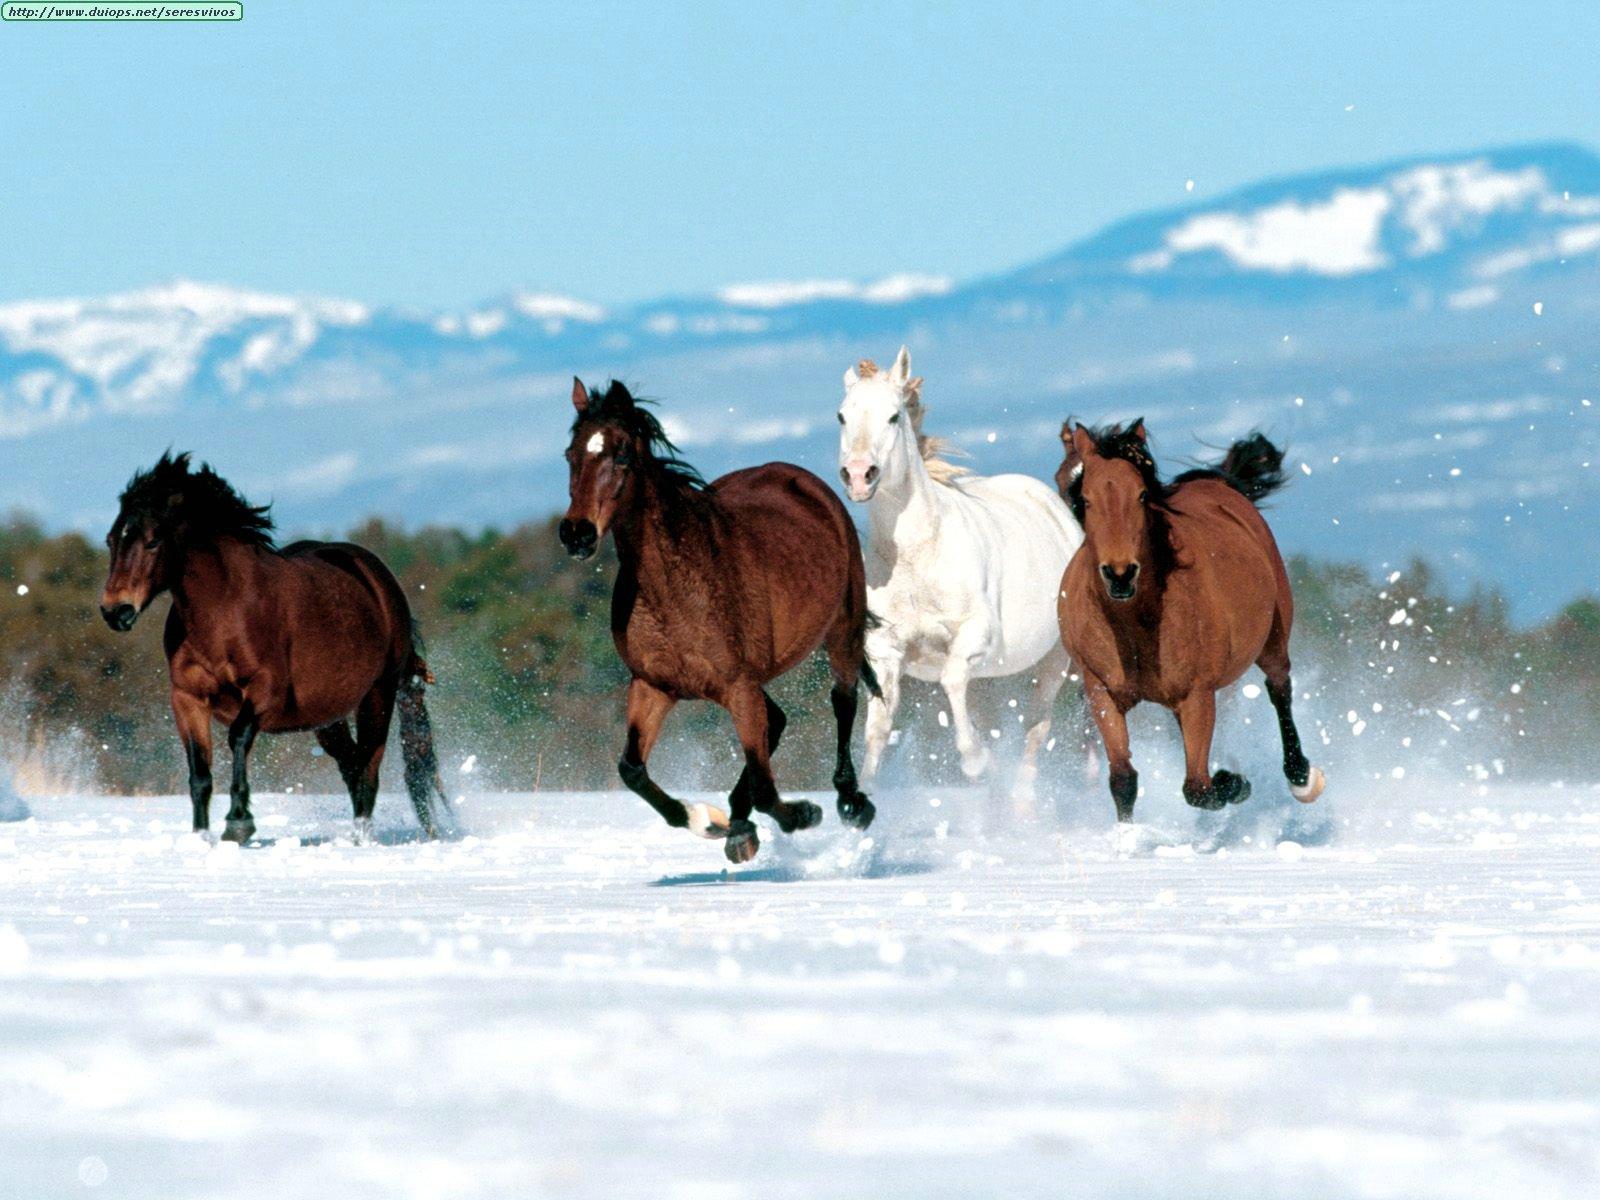 http://www.duiops.net/seresvivos/galeria/caballos/Animals%20Horses_Born%20to%20Run.jpg